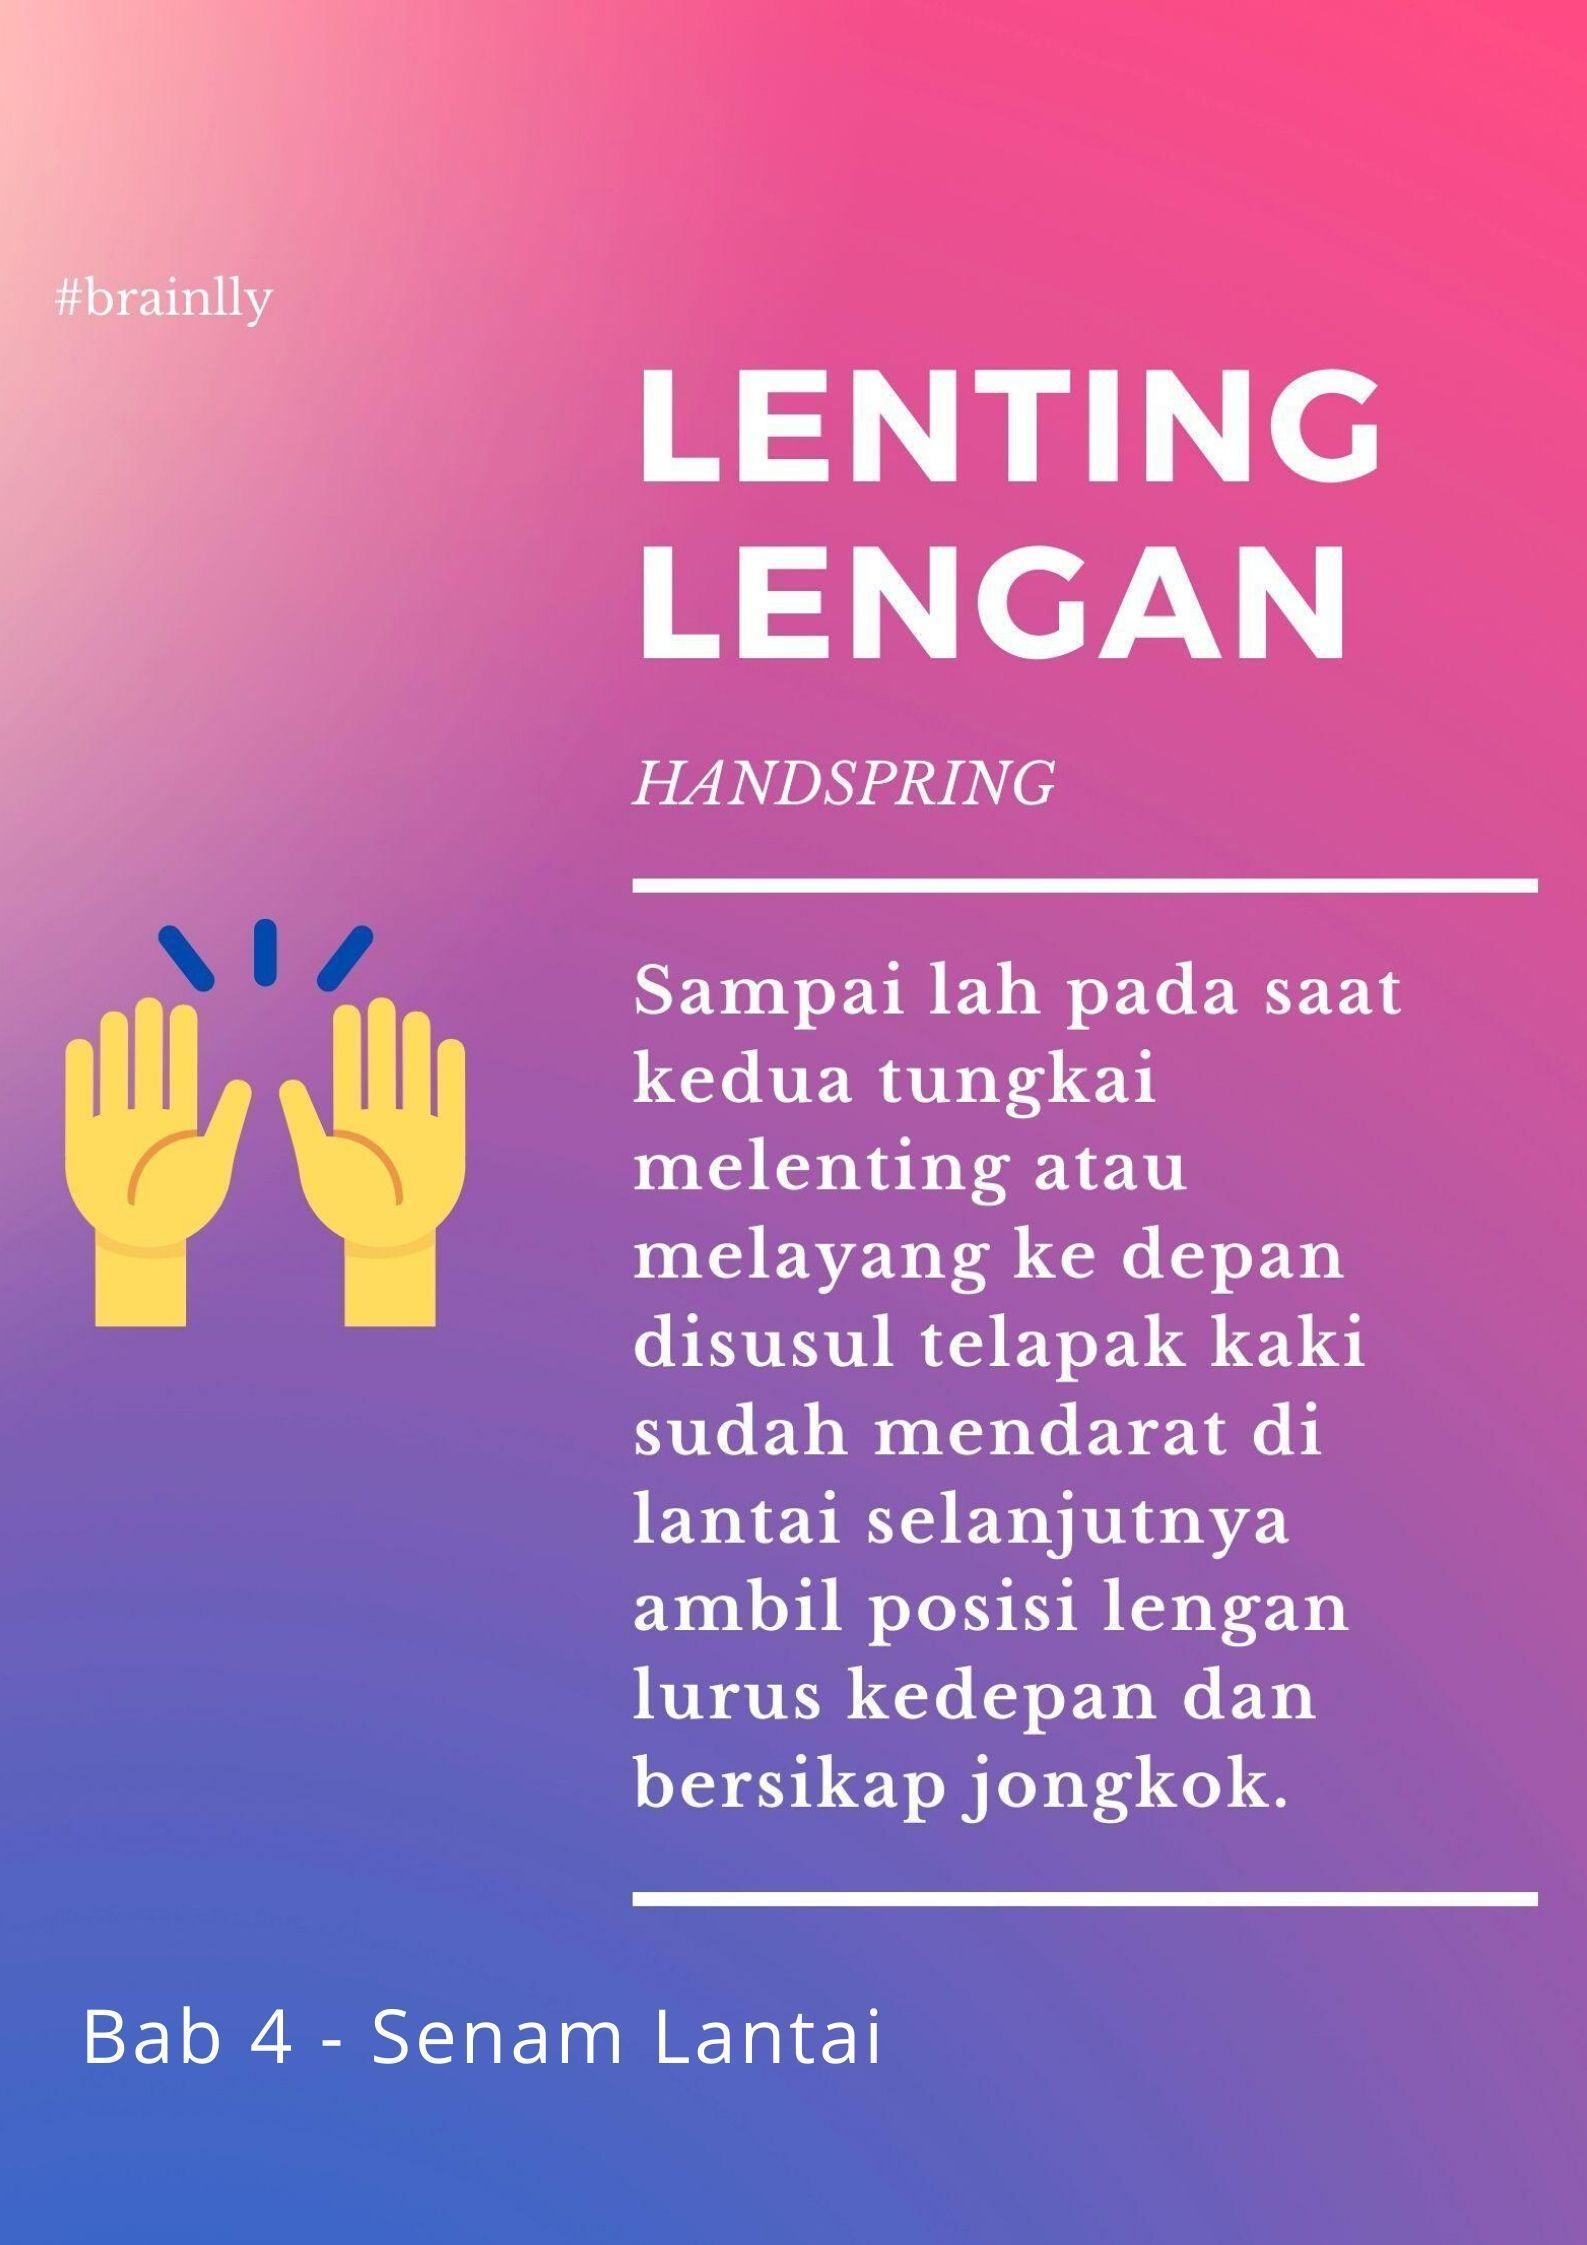 Cara Melakukan Gerakan Lenting Tangan : melakukan, gerakan, lenting, tangan, Lentig, Tangan, Diawali, Dengan, Gerakan, Brainly.co.id